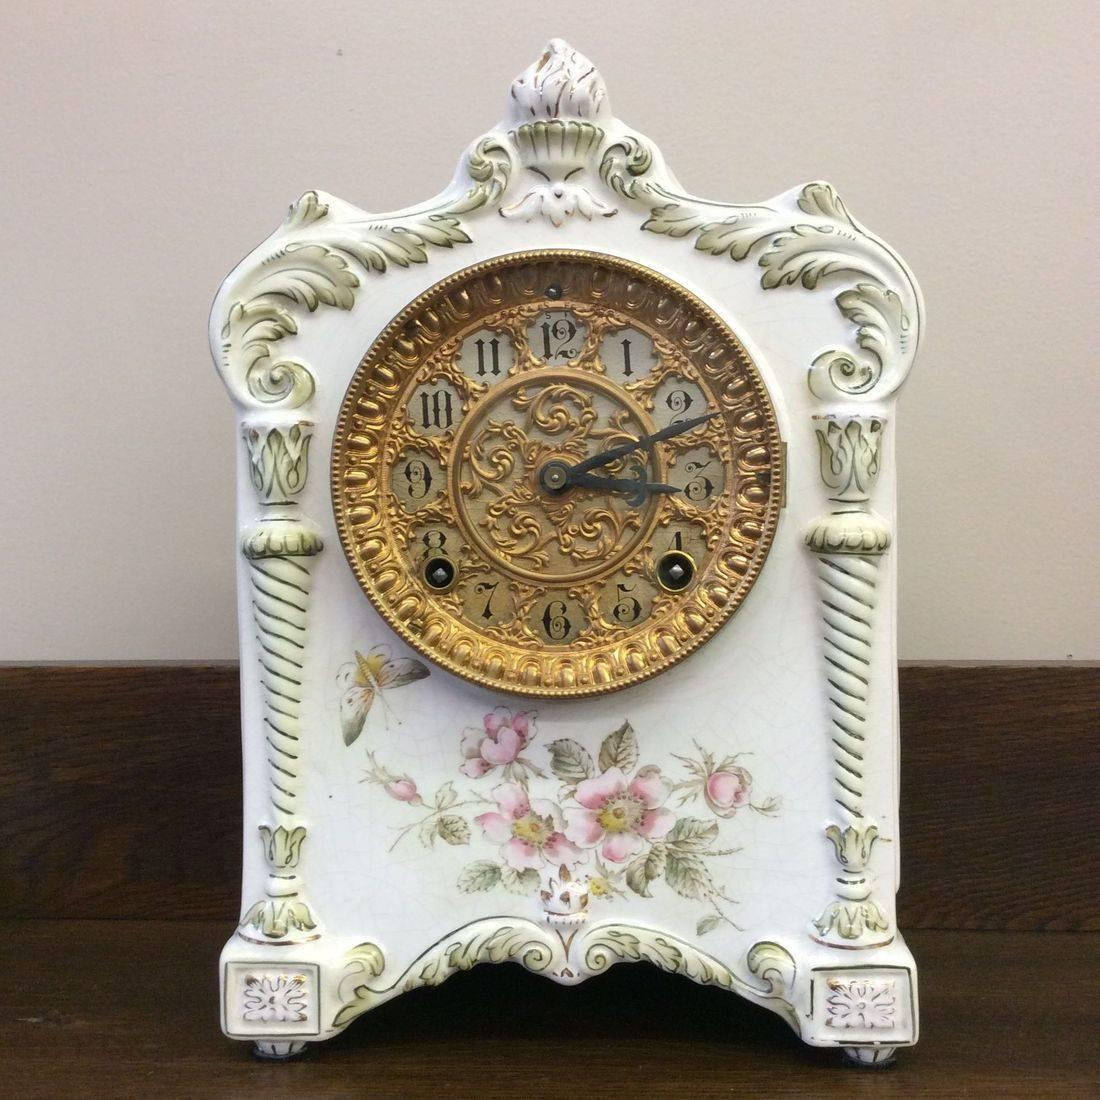 "Pat. June 18, 1882 Ansonia Clock Co.  ""Working""  Porcelain Mantle Clock  8-1/2"" x 5"" x 12""   Excellent condition.  $300.00"